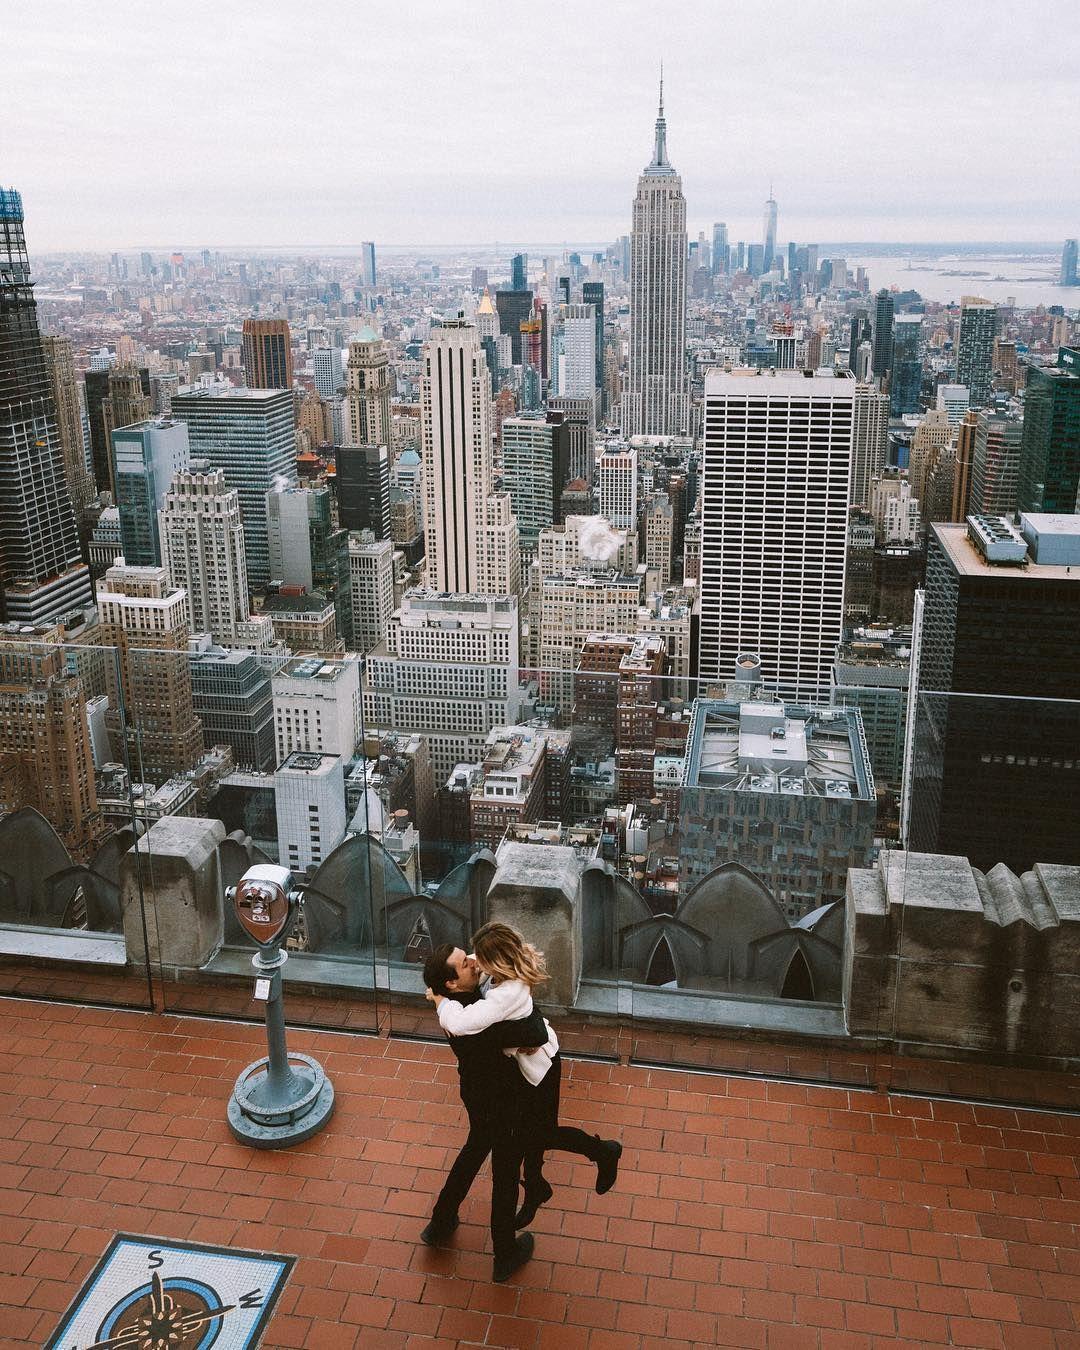 Noho Nyc Instagram Photo By Chandlelee New York City Ny City Nyc Instagram